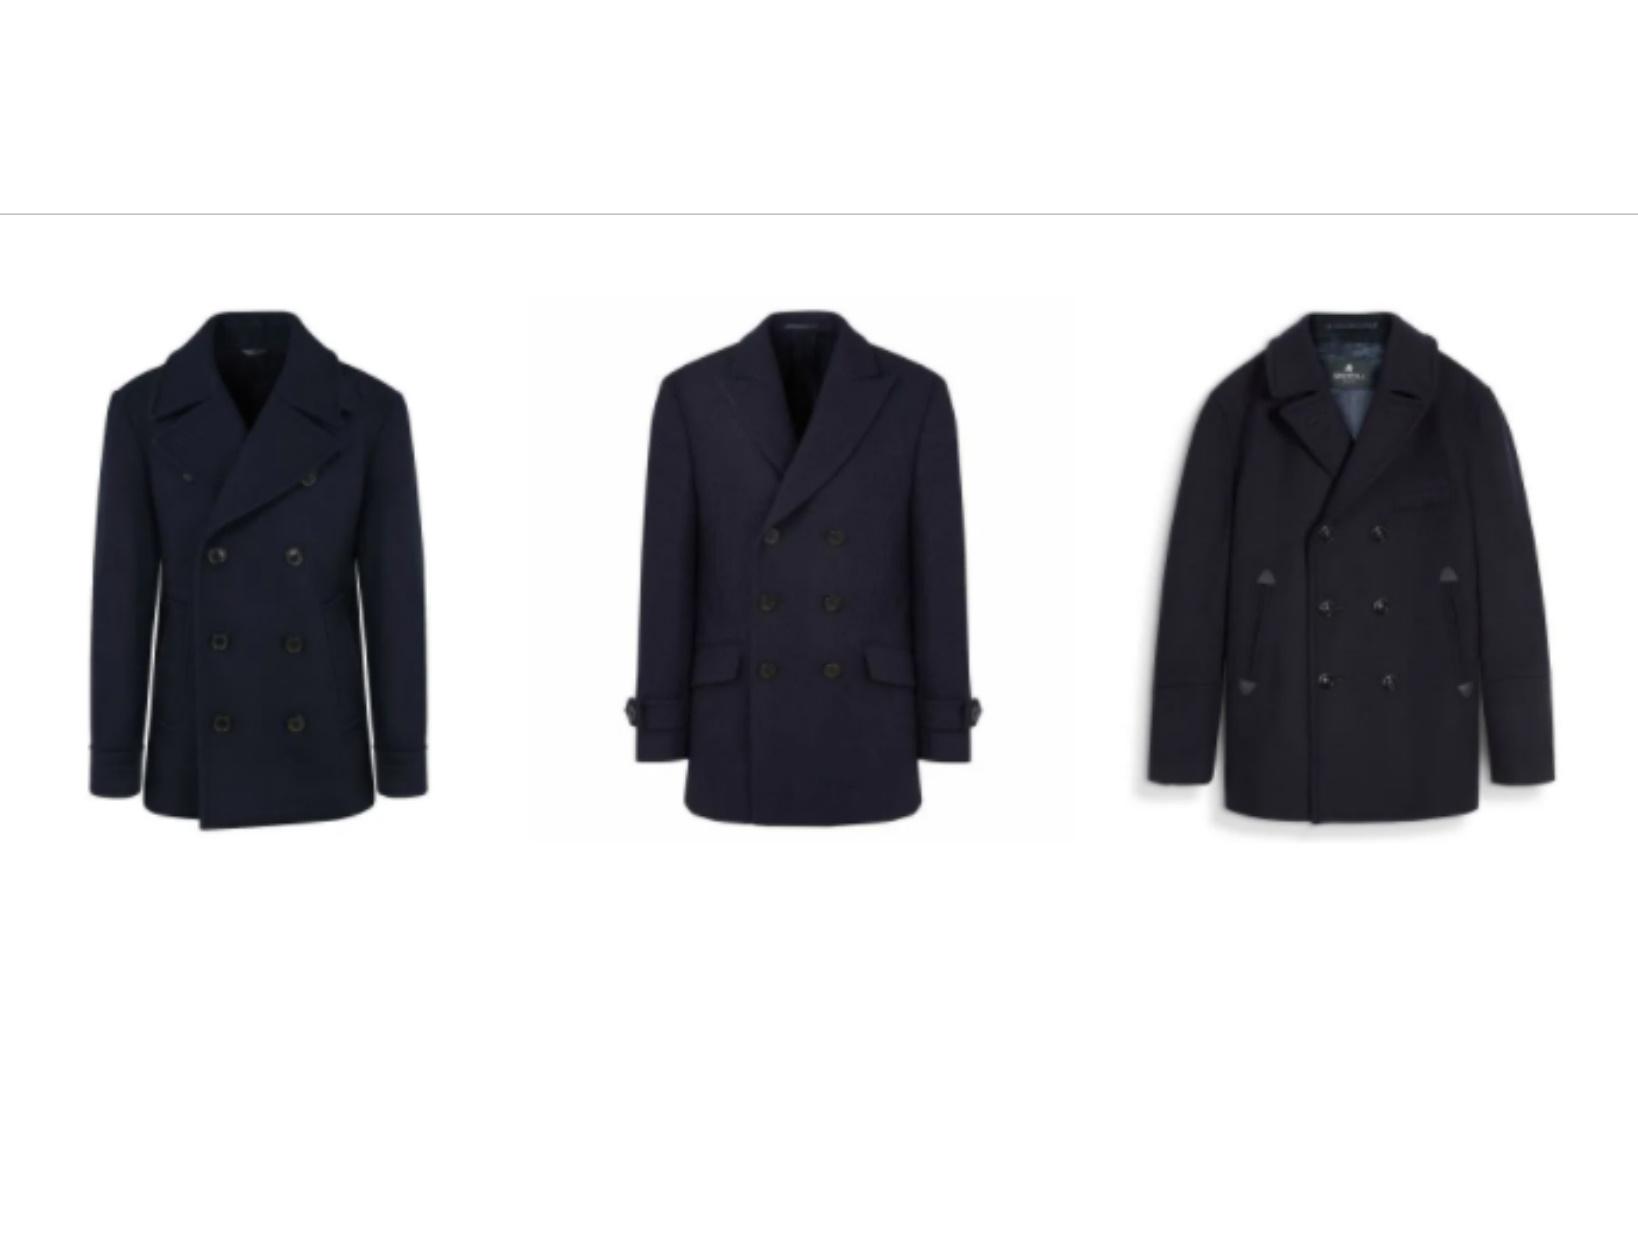 Pea Coat: Η ιστορία πίσω από το πιο κλασικό παλτό